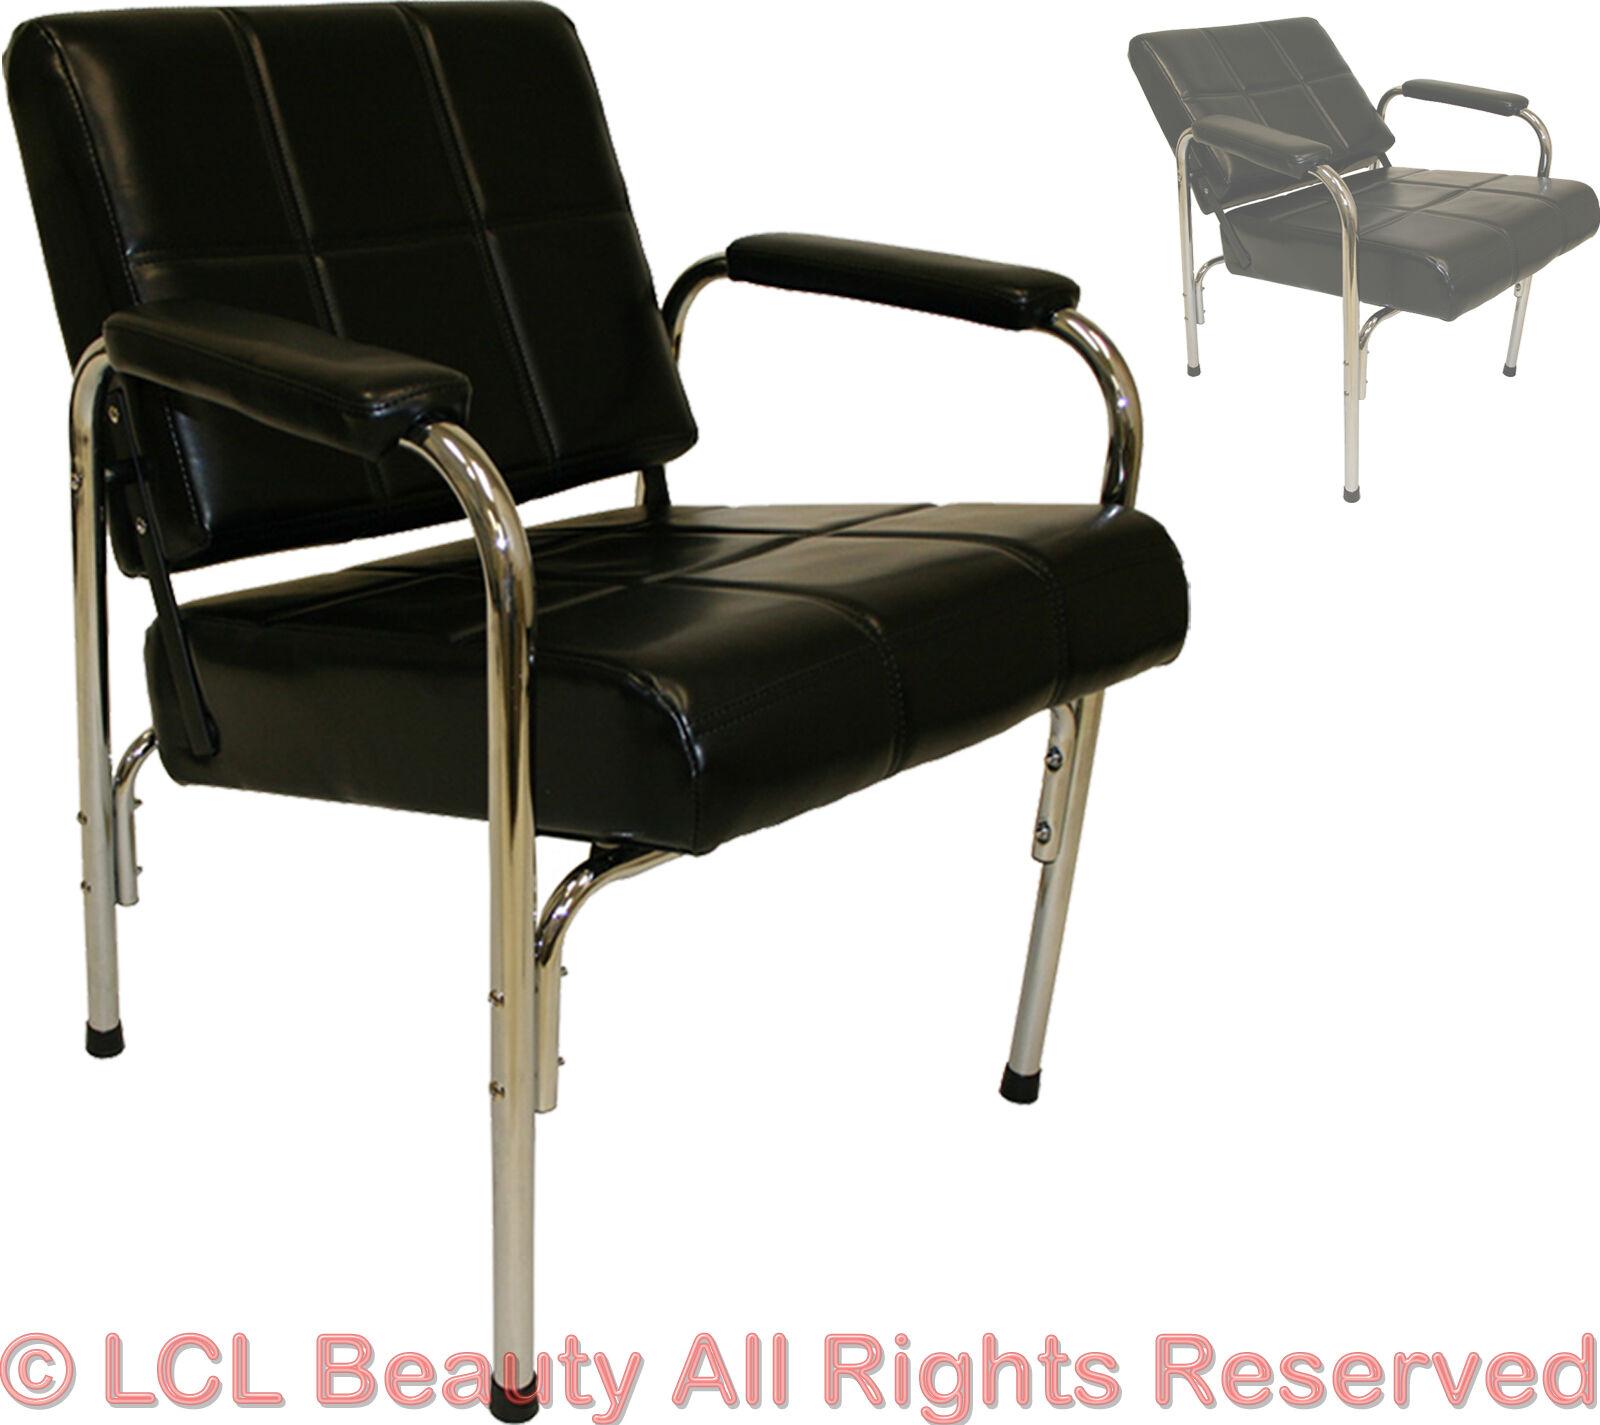 Shampoo Chair Auto Recline Reclining Barber Hair Styling Beauty Salon Equipment